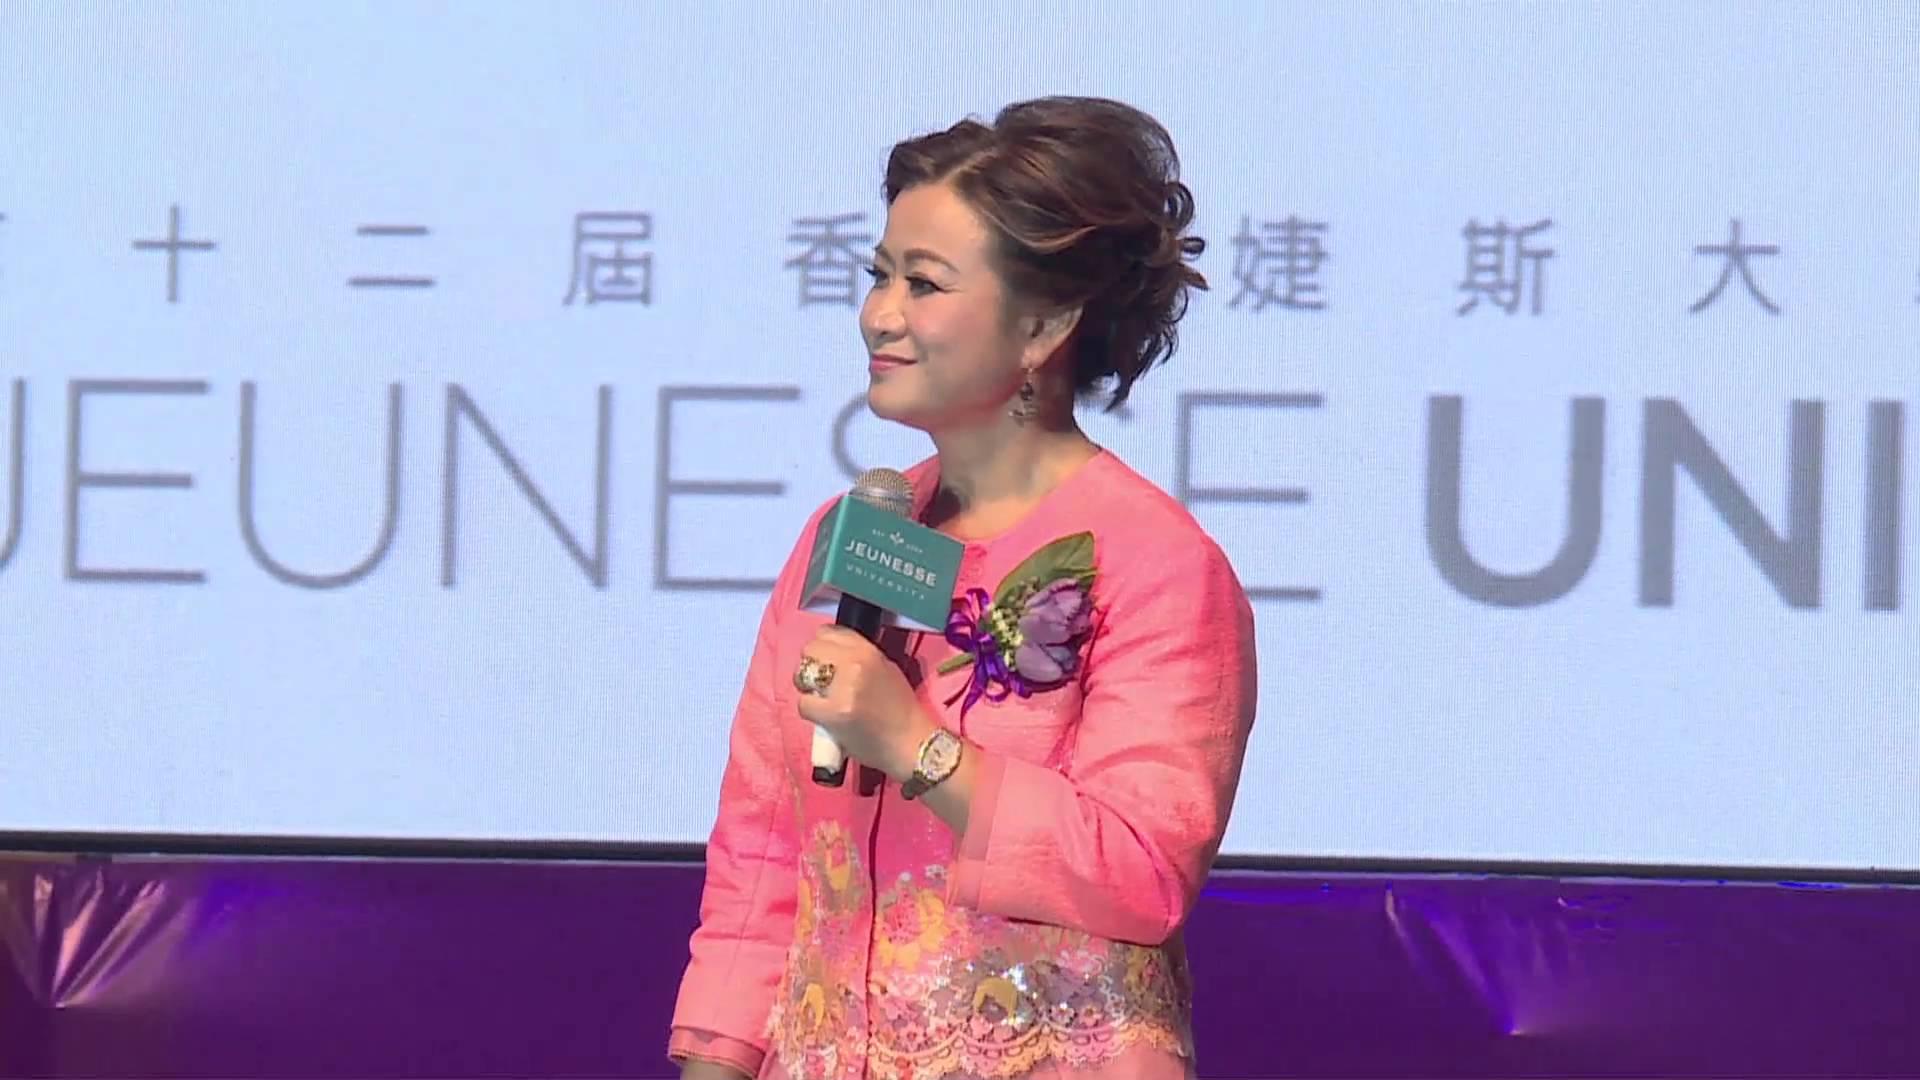 Kim Hui